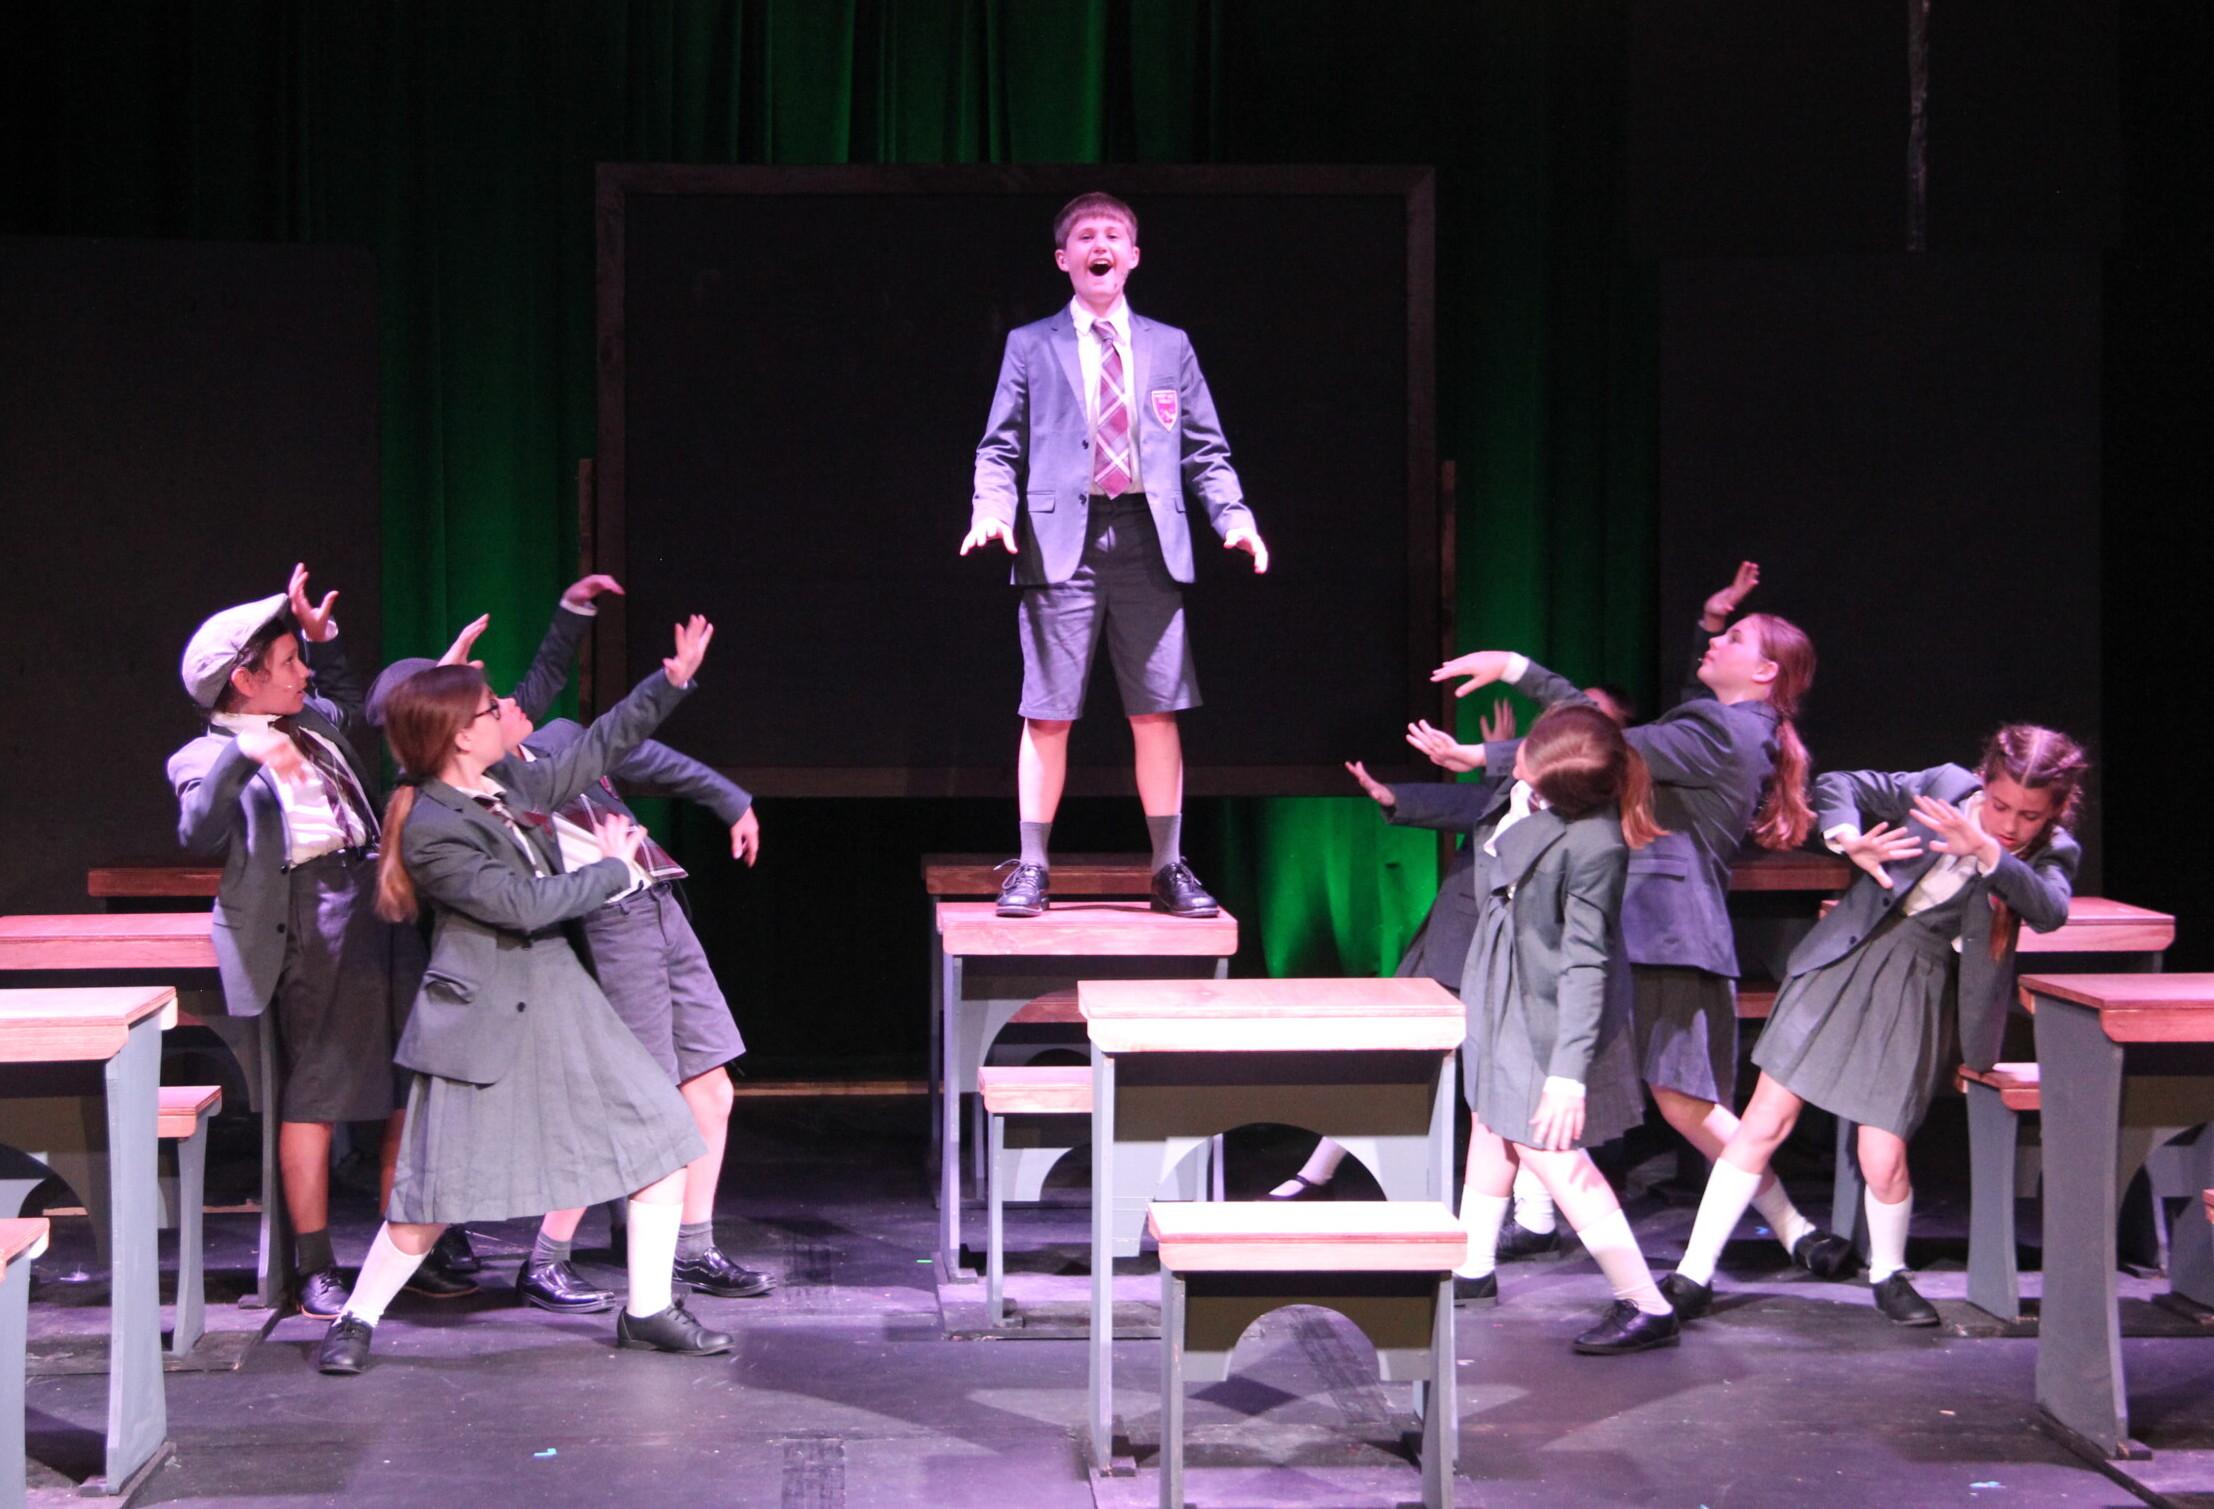 Actors performing Revolting Children in Matilda